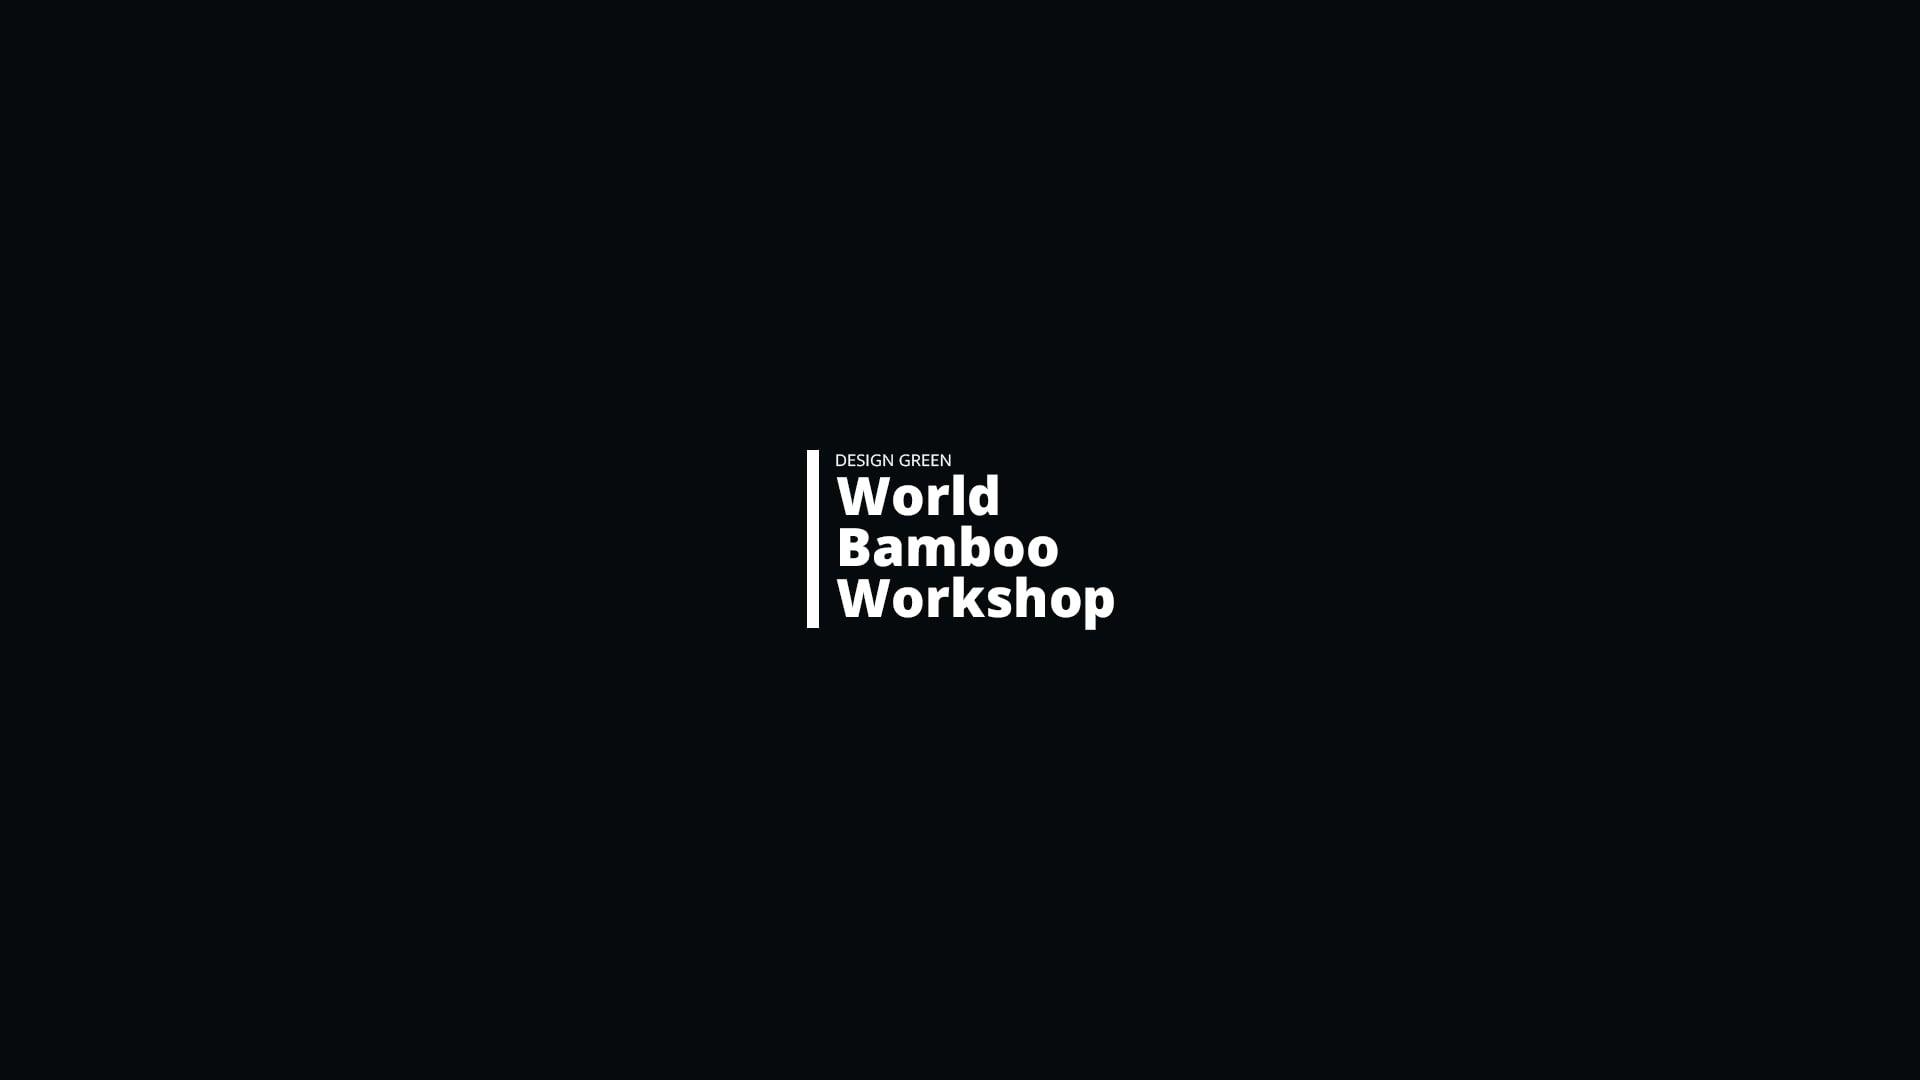 World Bamboo Workshop 2017